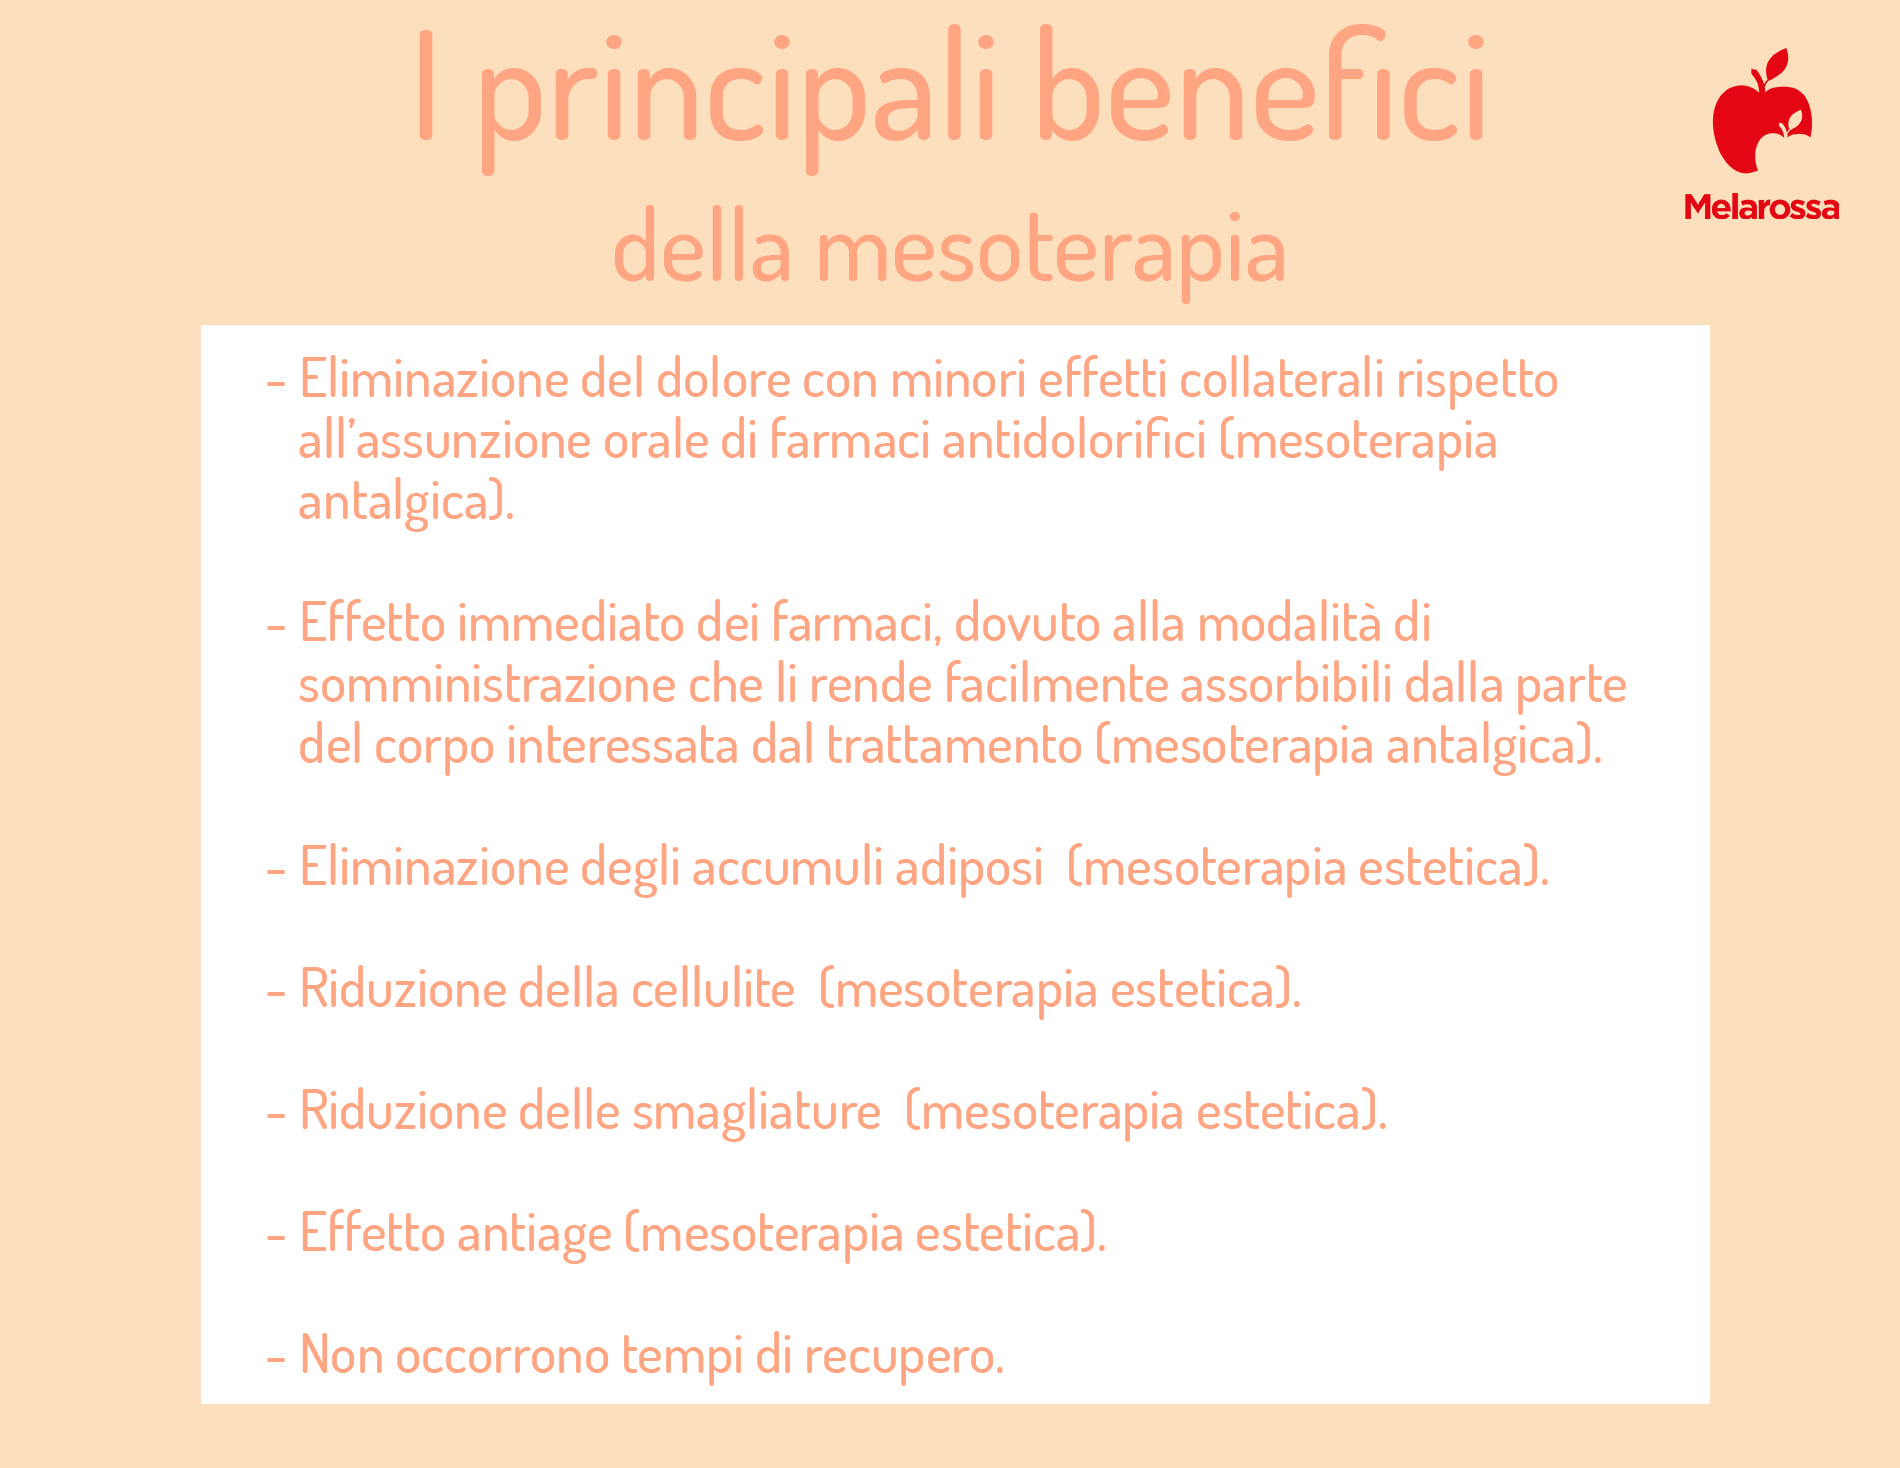 mesoterapia: benefici